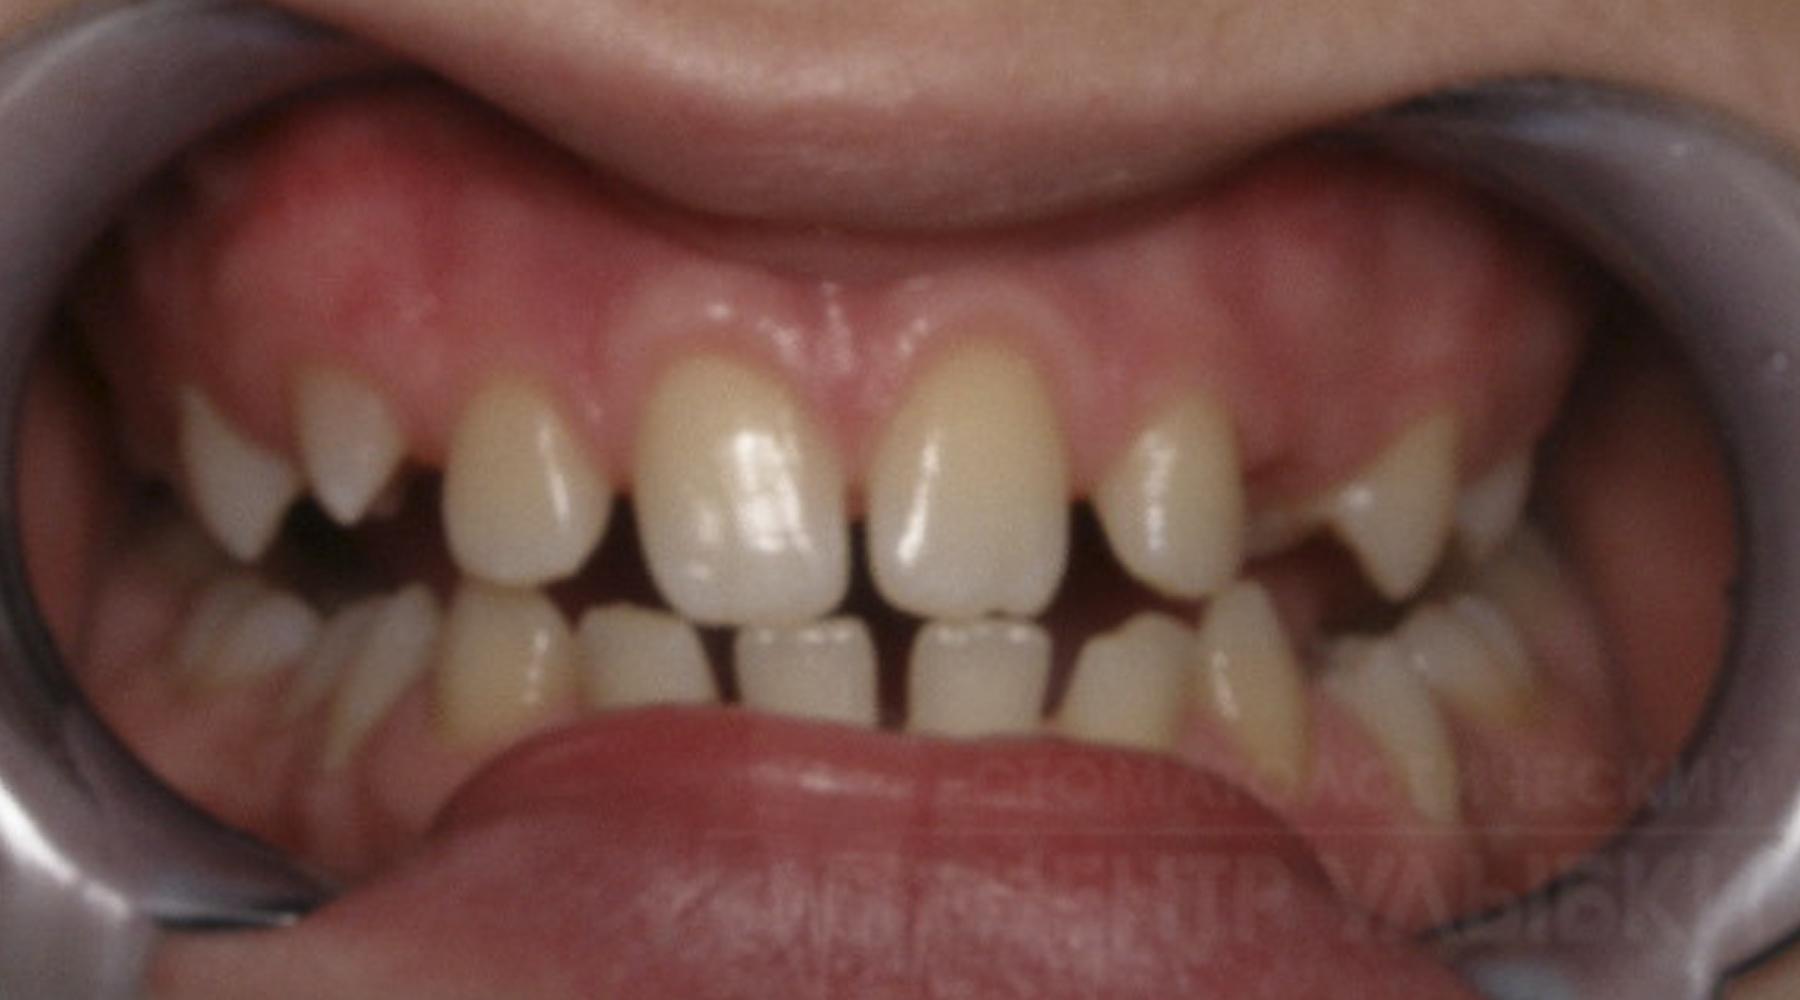 после лечения зуба появился запах изо рта